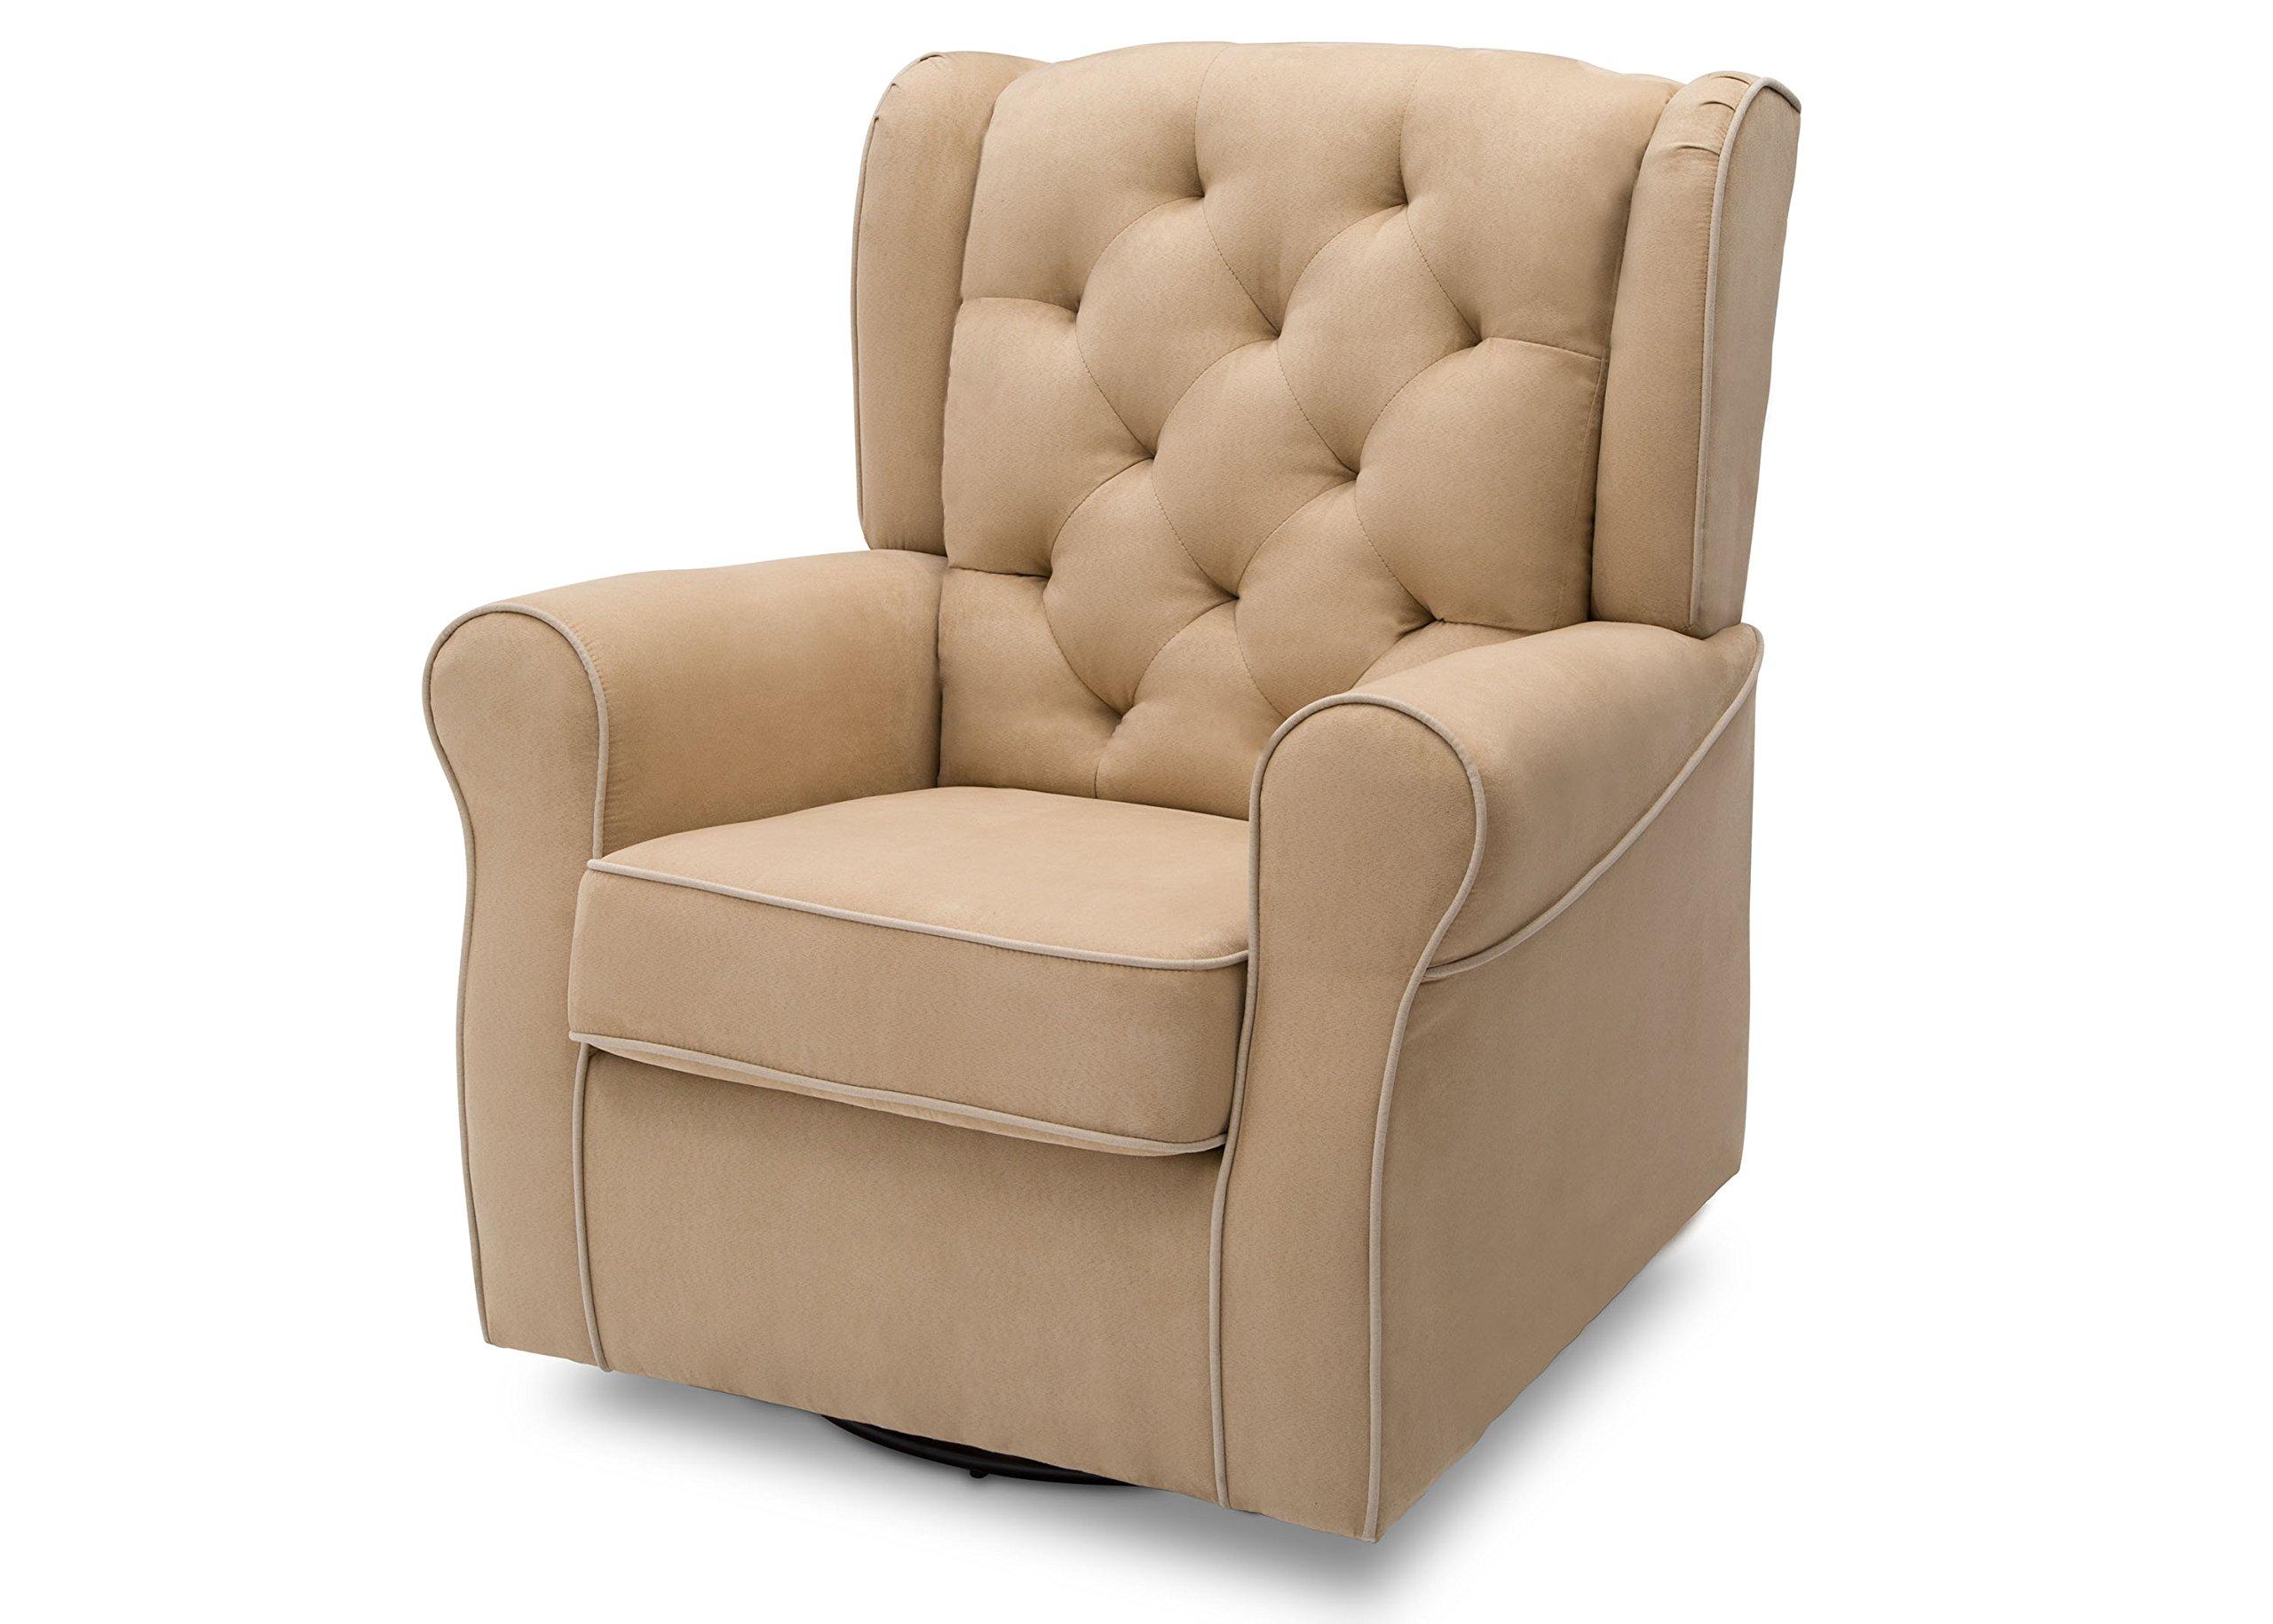 Delta Furniture Emerson Upholstered Glider Swivel Rocker Chair, Beige with Ecru Welt